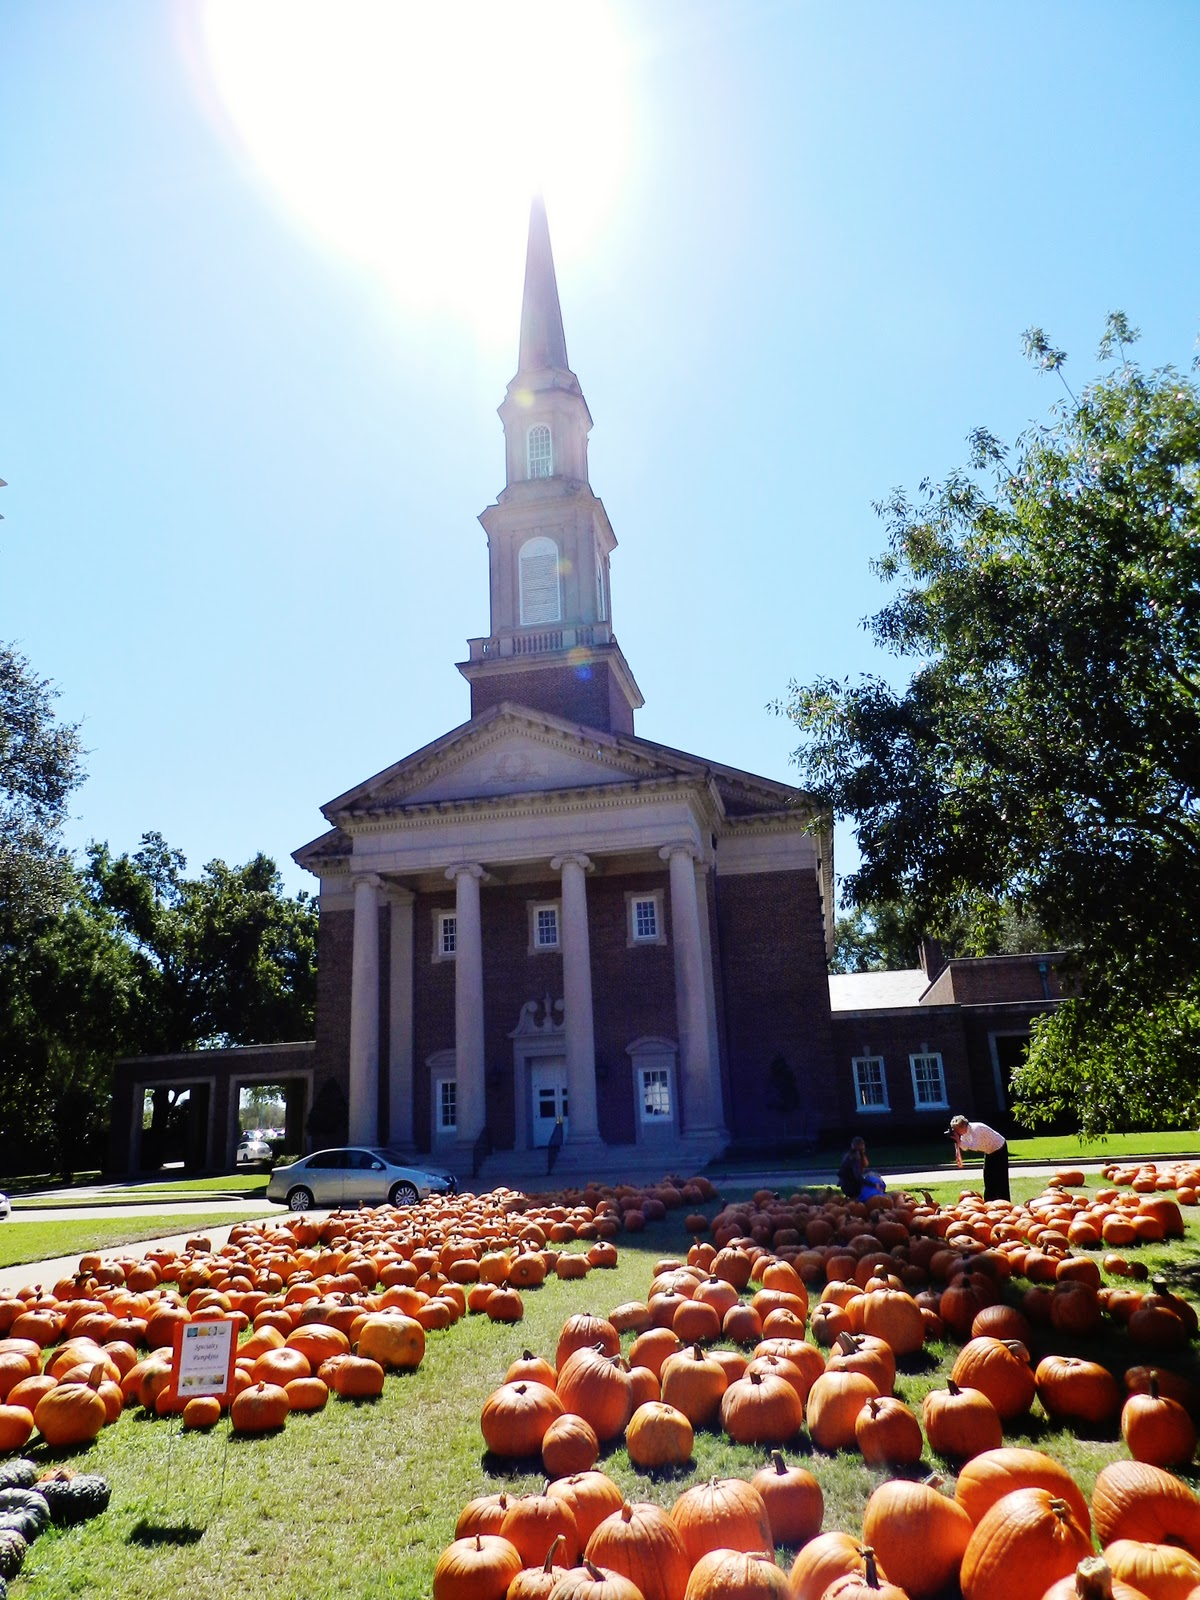 Houston Living: The Great Pumpkin! | Dear Polia